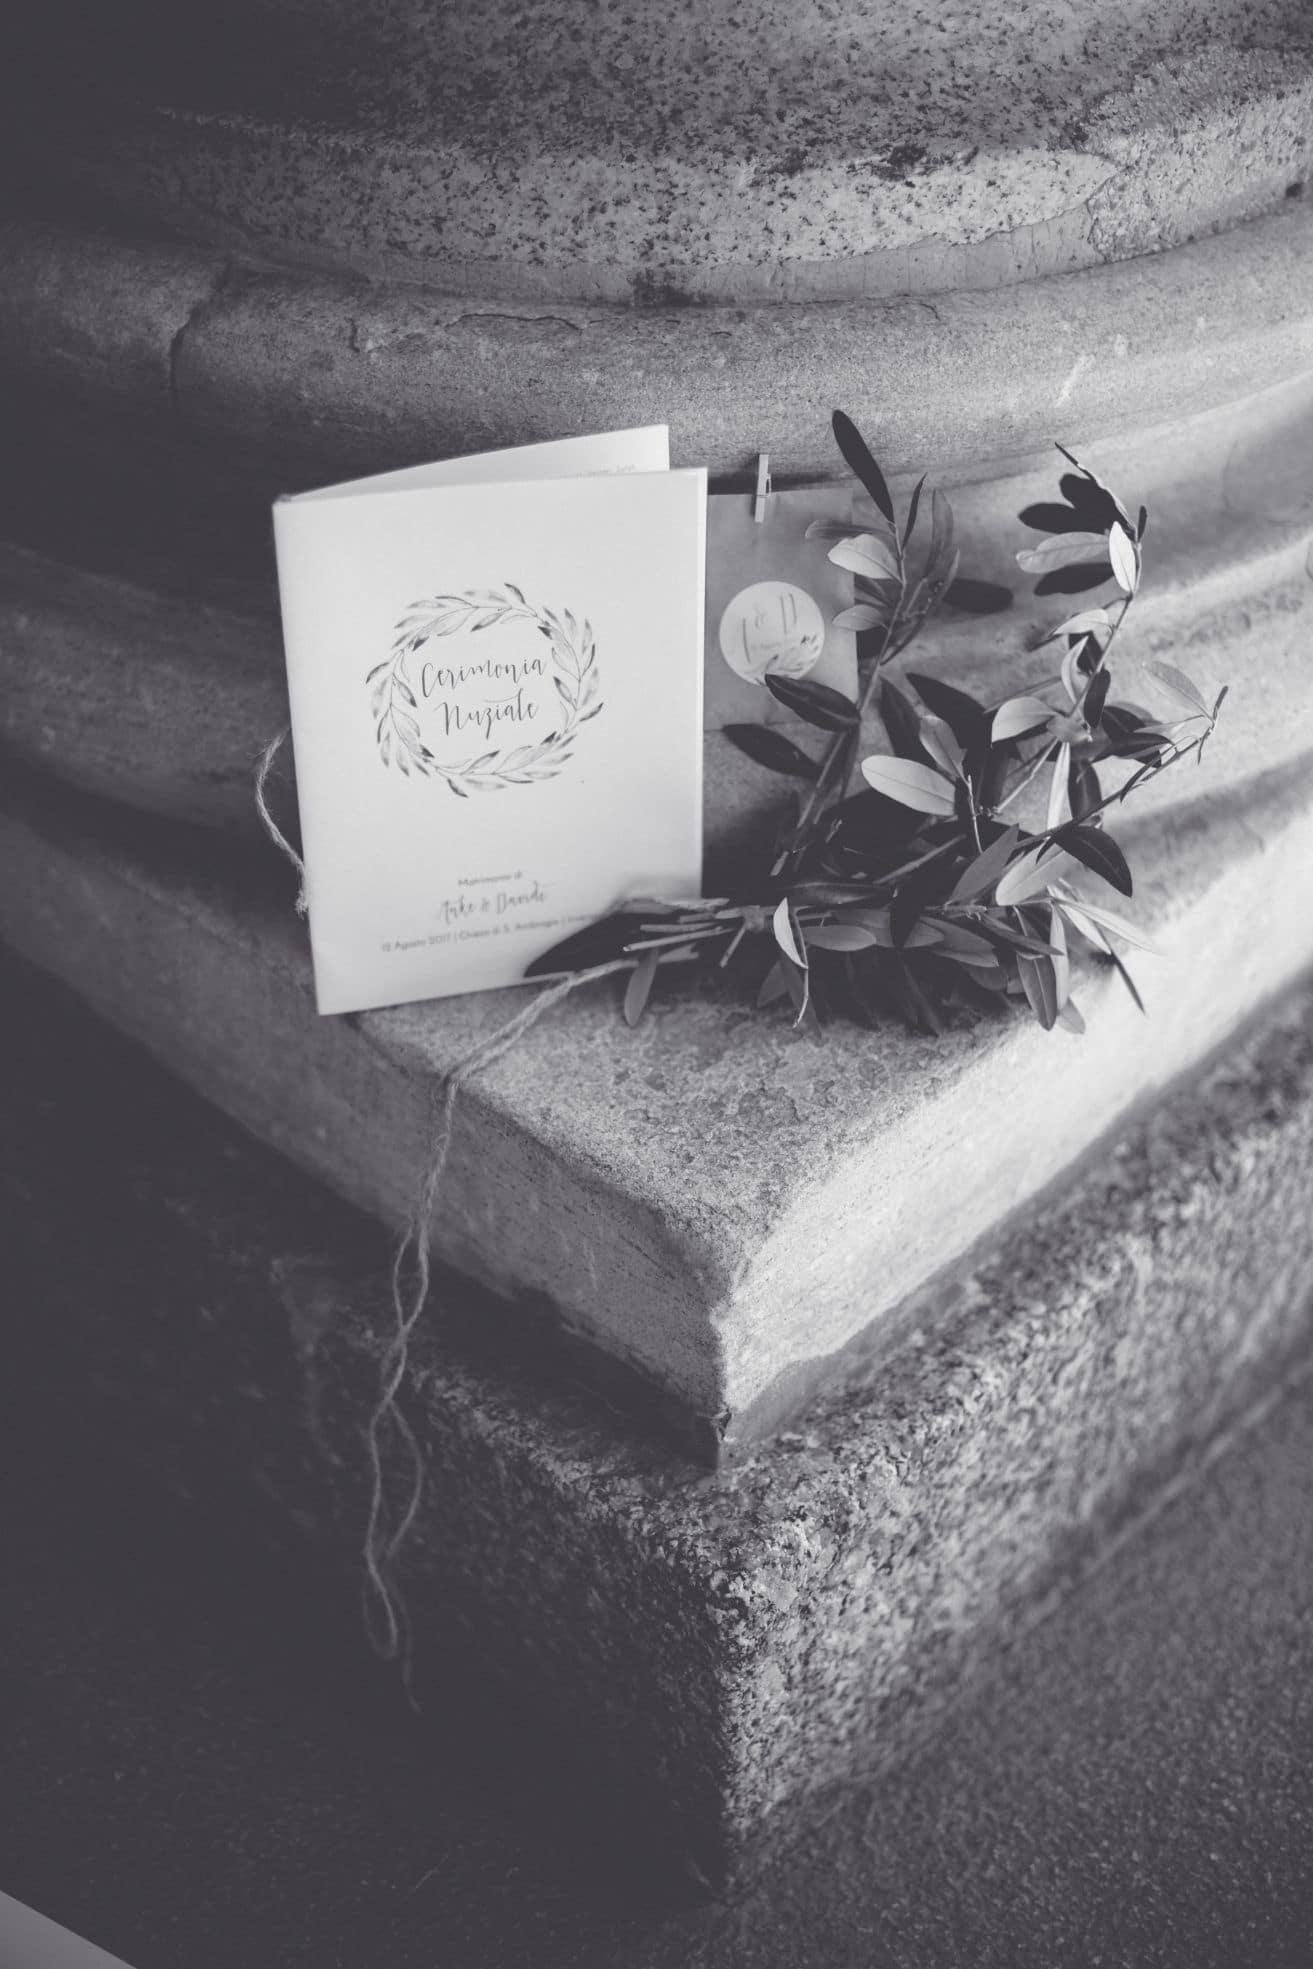 Million Memories_A&D_Hochzeitsfotograf_Schlosshochzeit_Toskana_Lago Di Como_Wedding_Tuscany_078